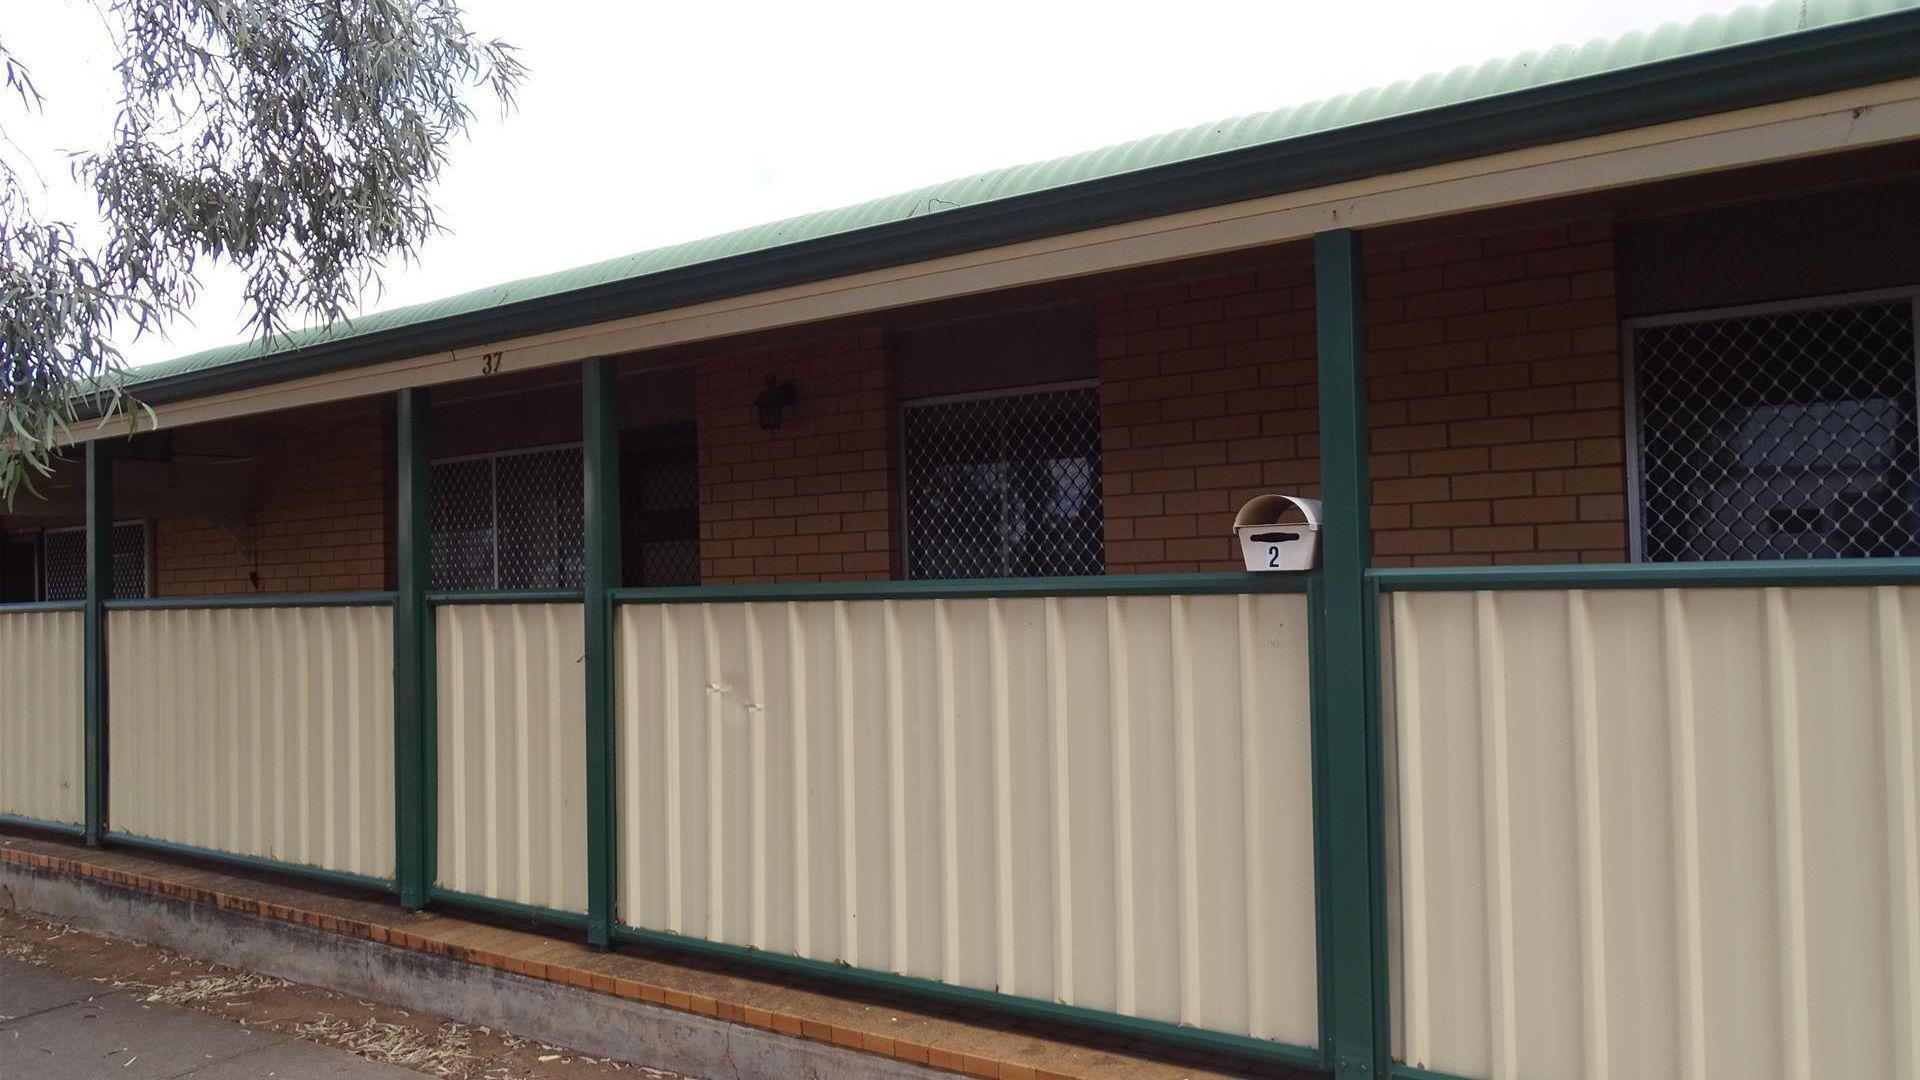 2/37 Bonanza Street, Broken Hill NSW 2880, Image 1